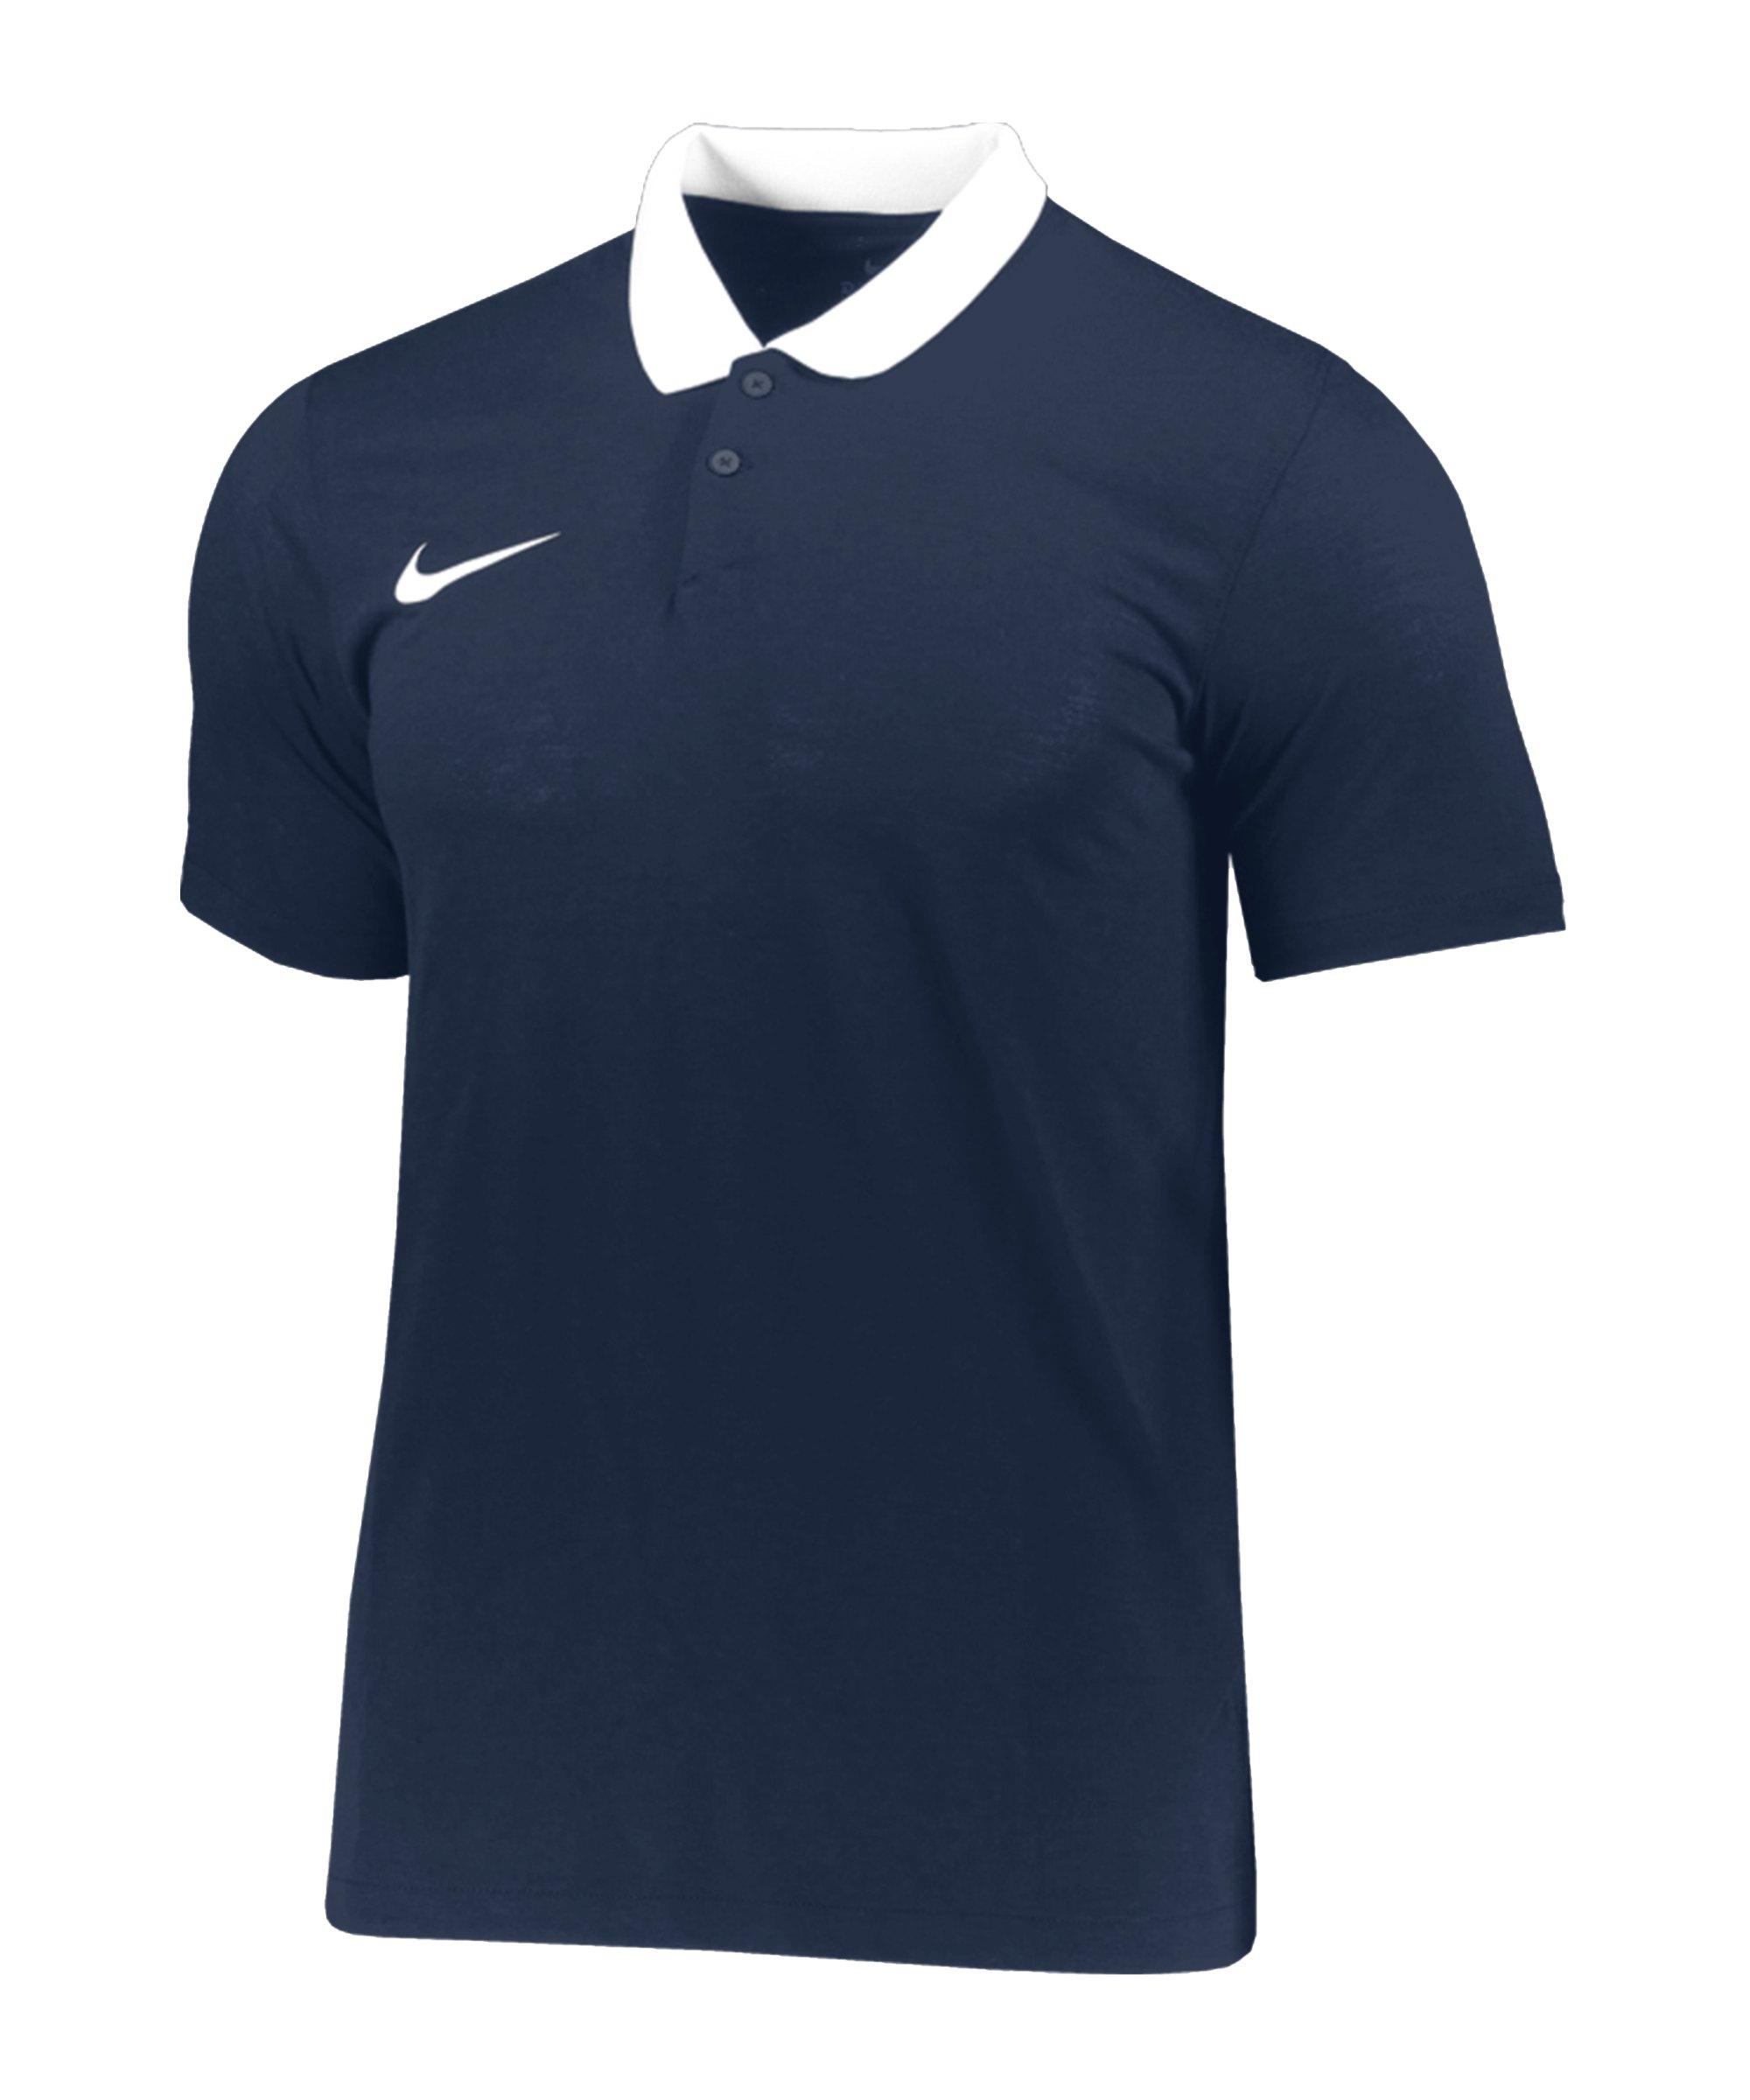 Nike Park 20 Poloshirt Kids Blau Weiss F451 - blau